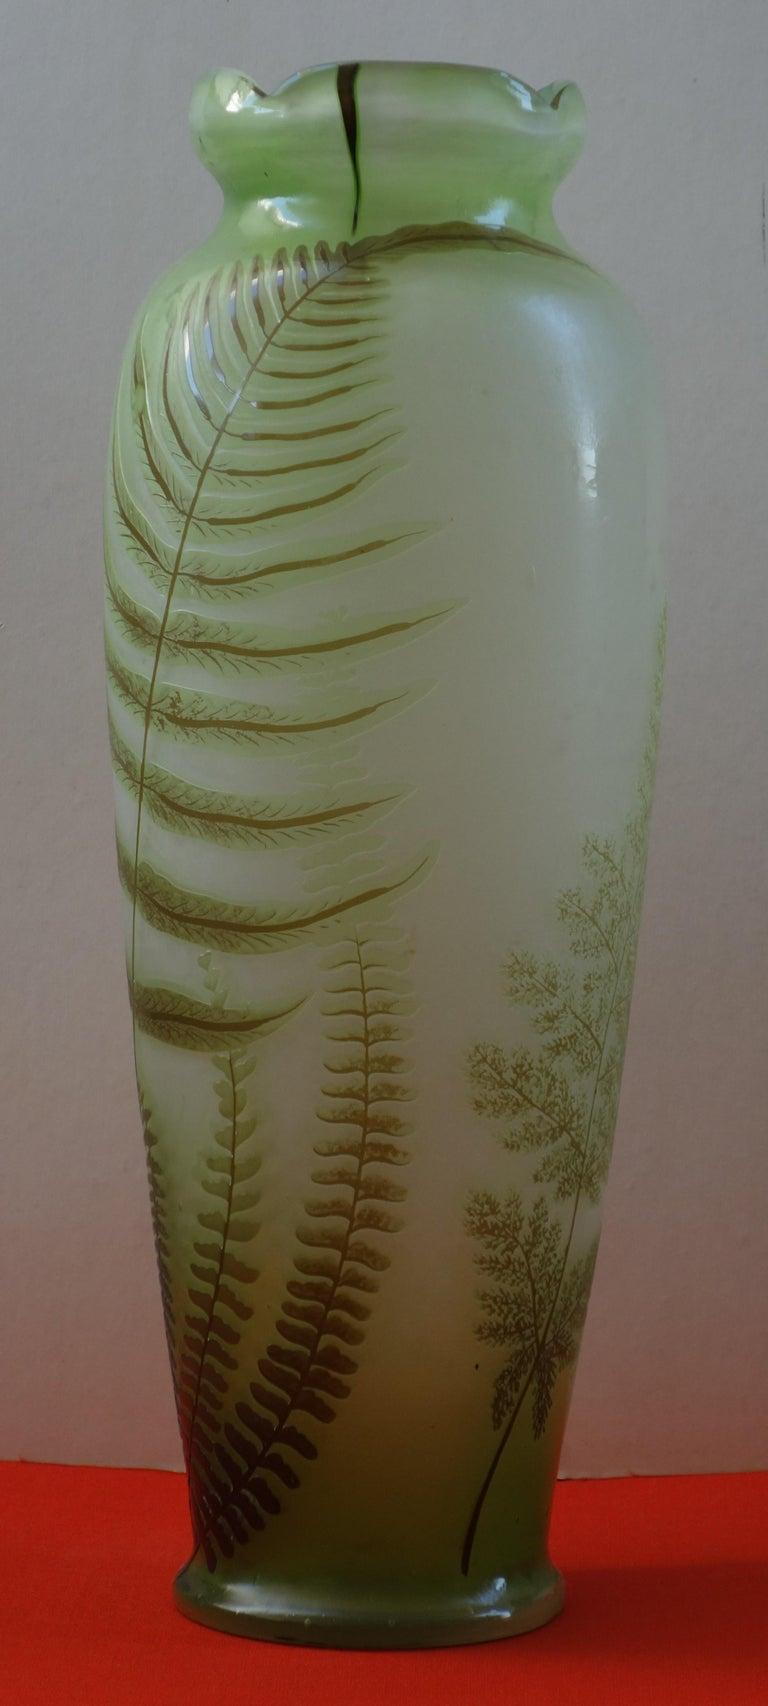 Art Nouveau French Cameo Glass 'Fern Vase' by Emile Gallé, Nancy - 42cm High For Sale 3